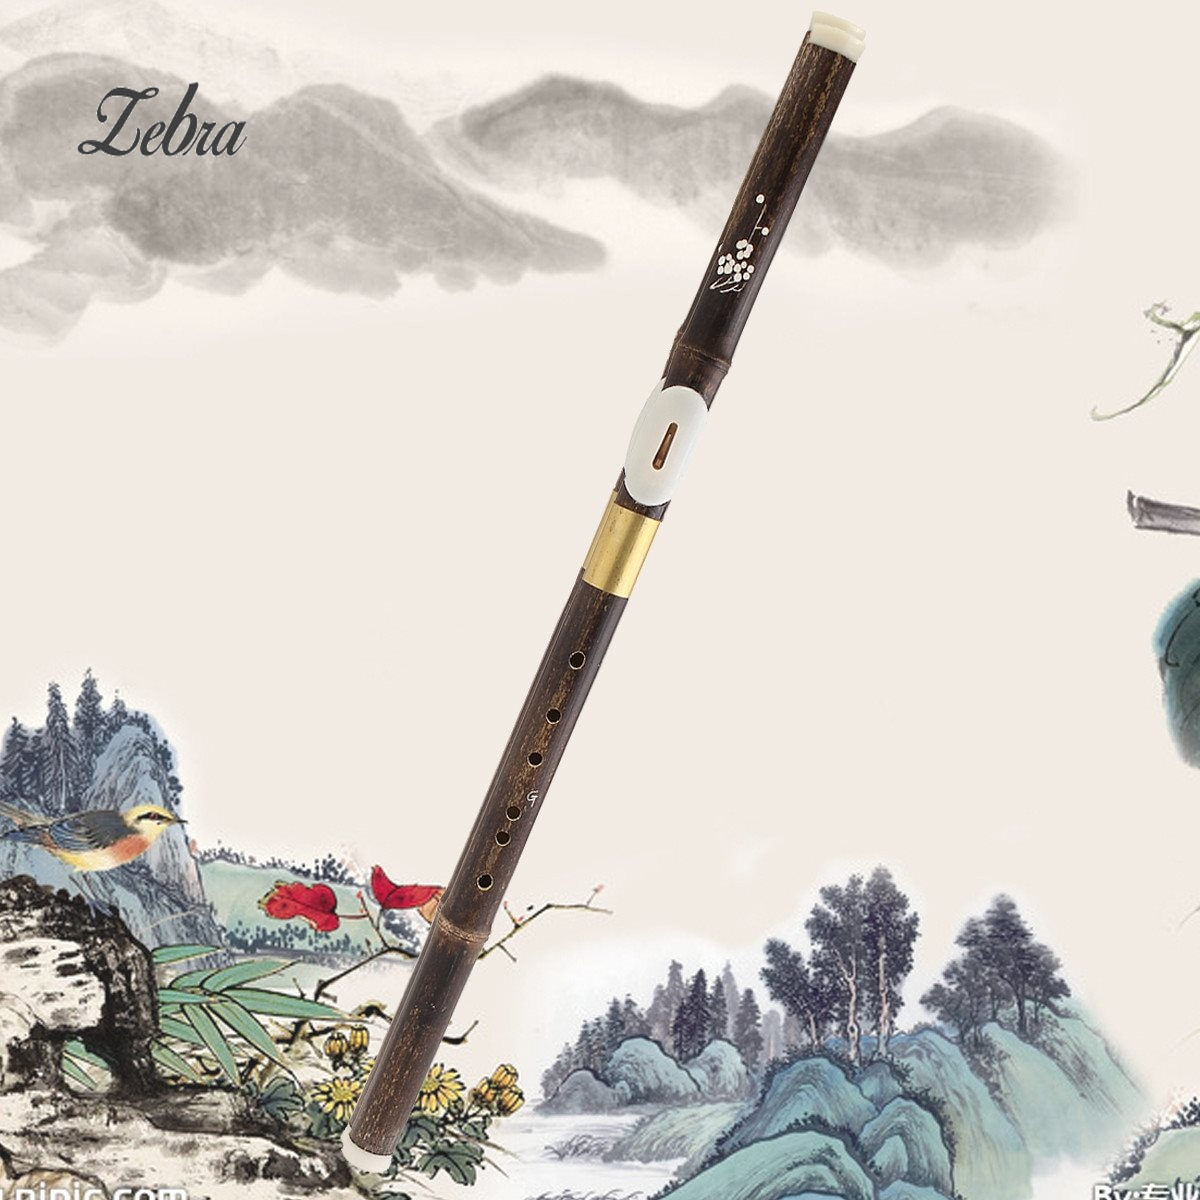 Zebra 560x23mm 6 agujeros GKey chino tradicional Vertical Shichiku flauta de bambú para el viento de madera instrumentos musicales amante principiante